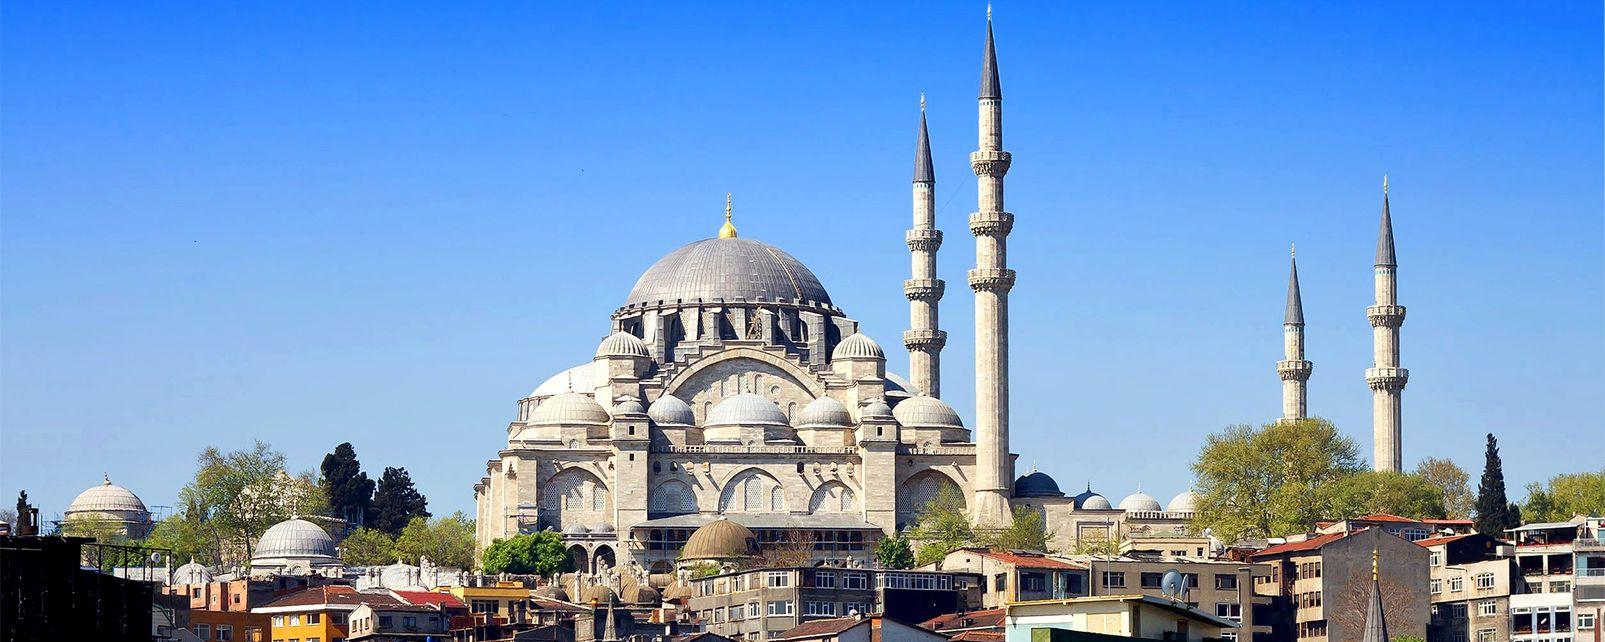 The Süleymaniye Mosque - Turkey